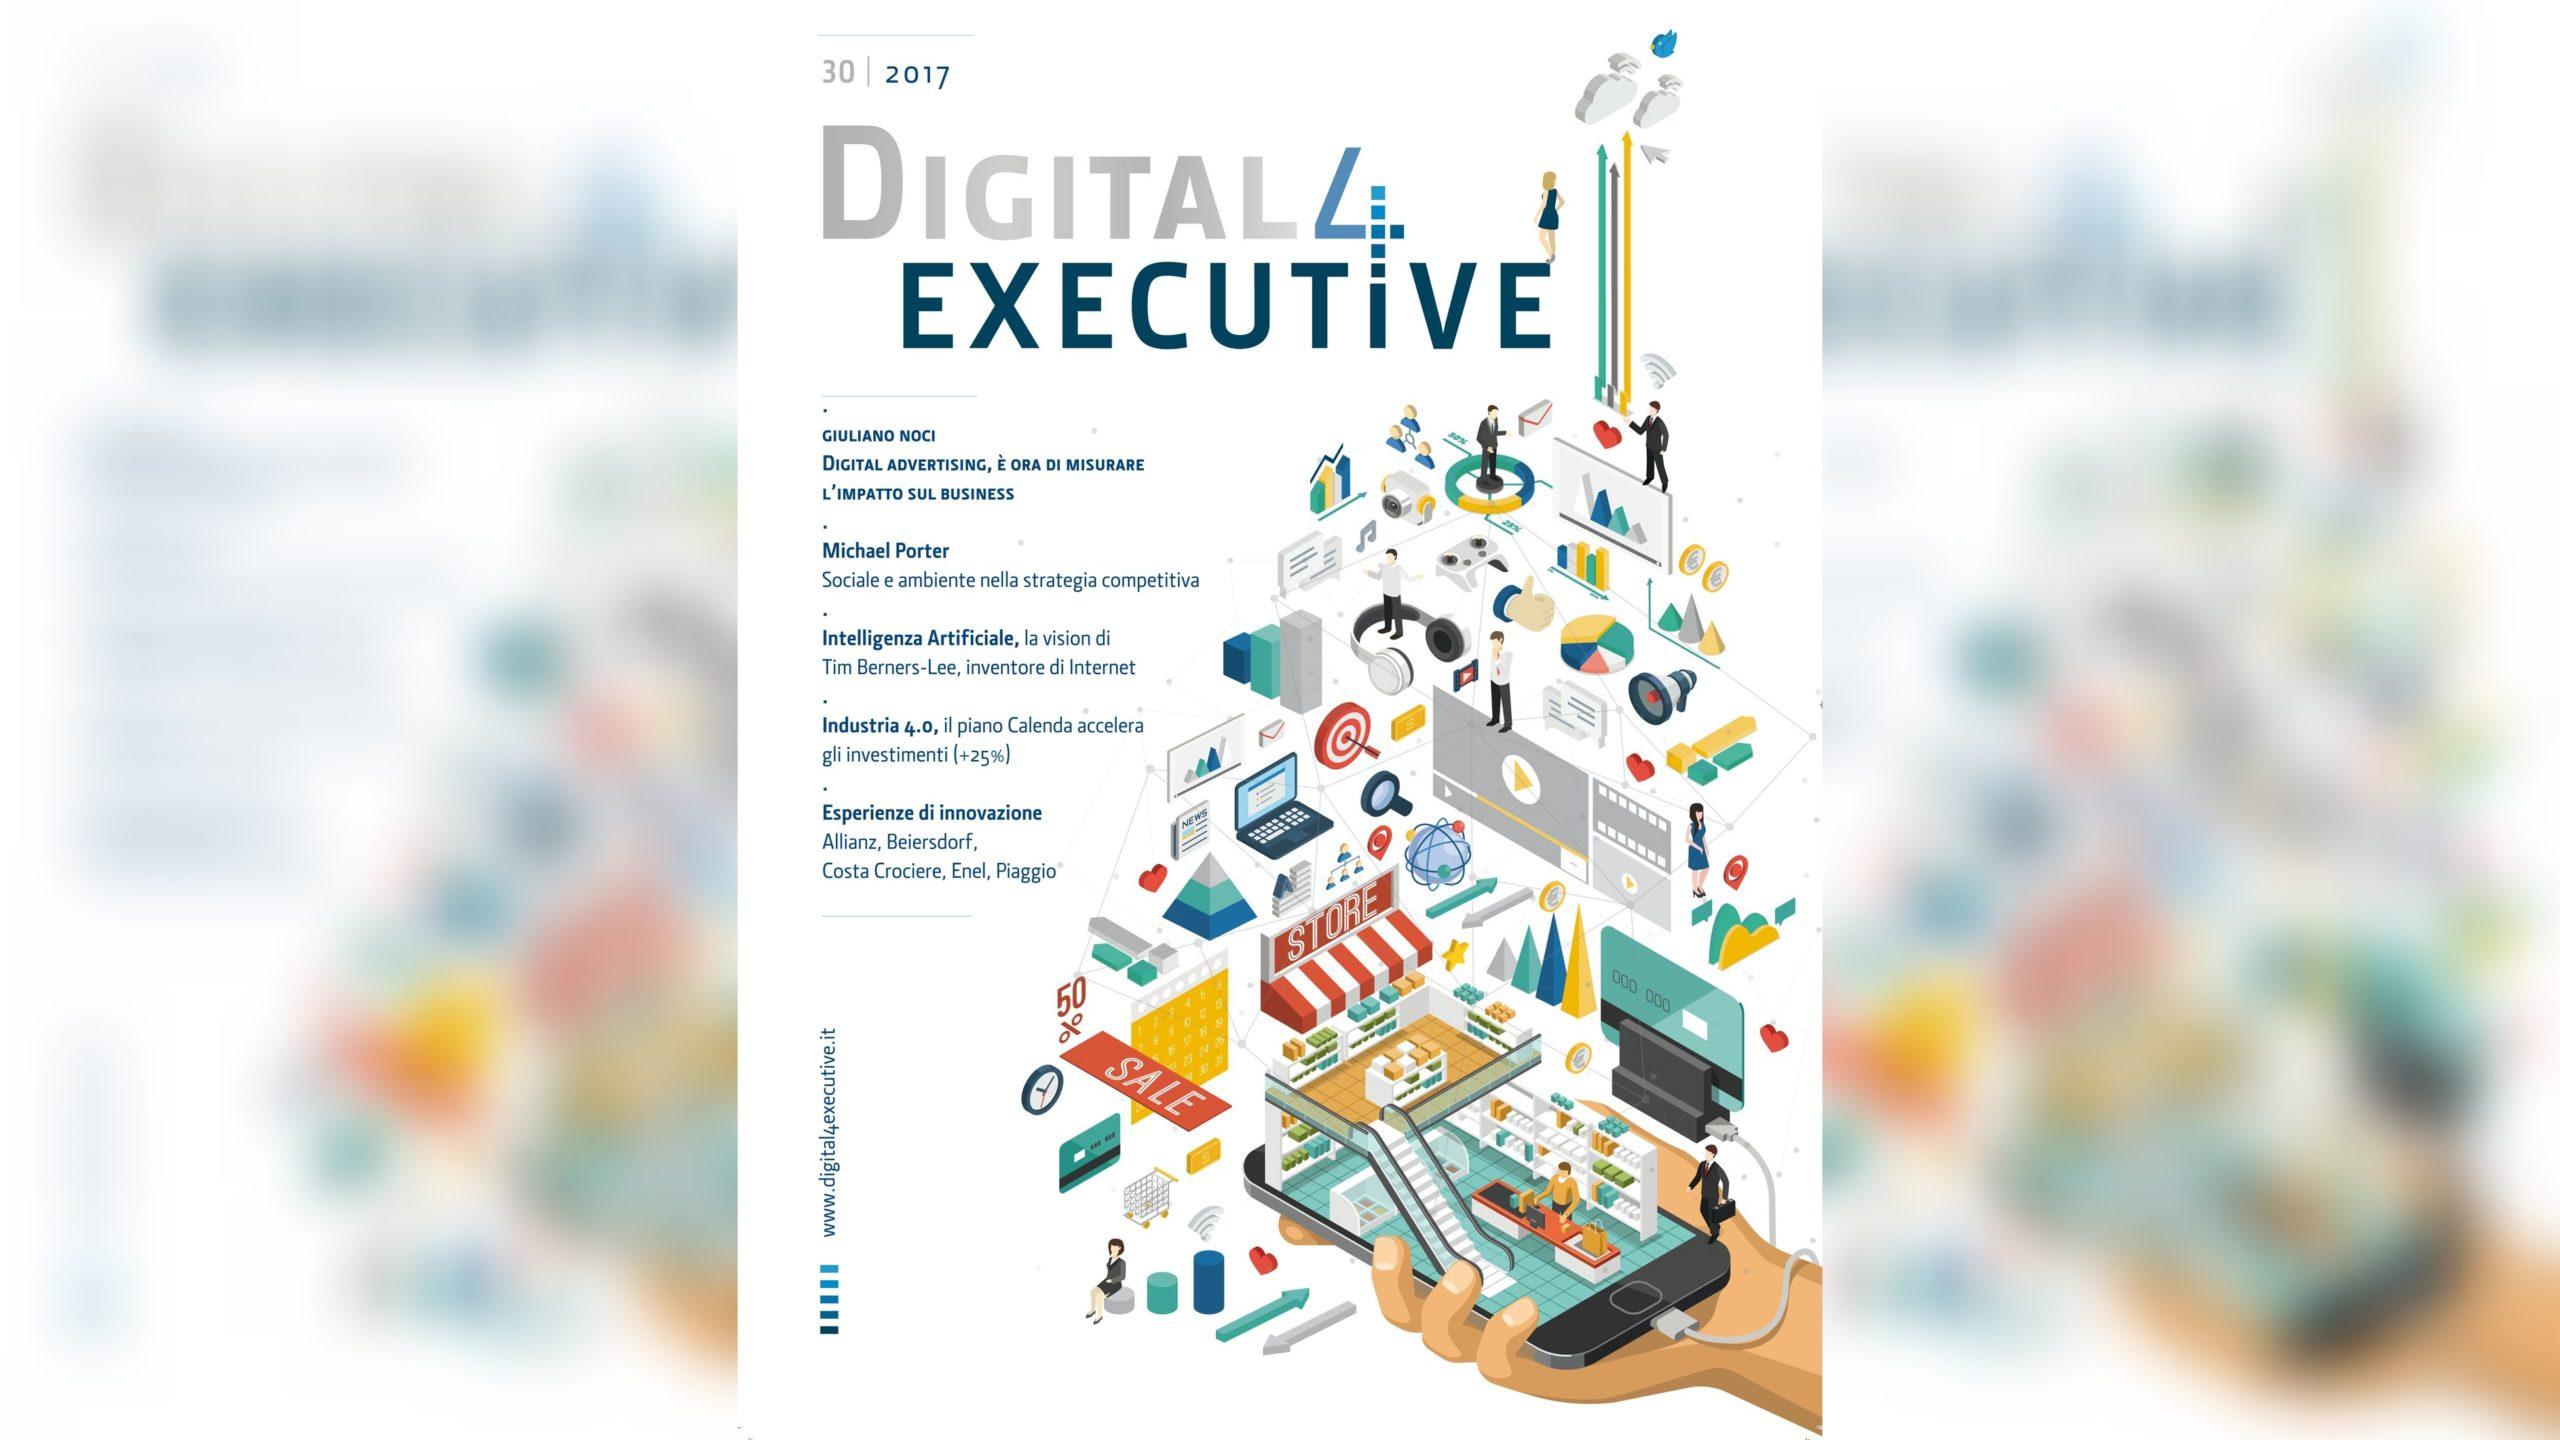 Competitive Data su Digital 4 Executive